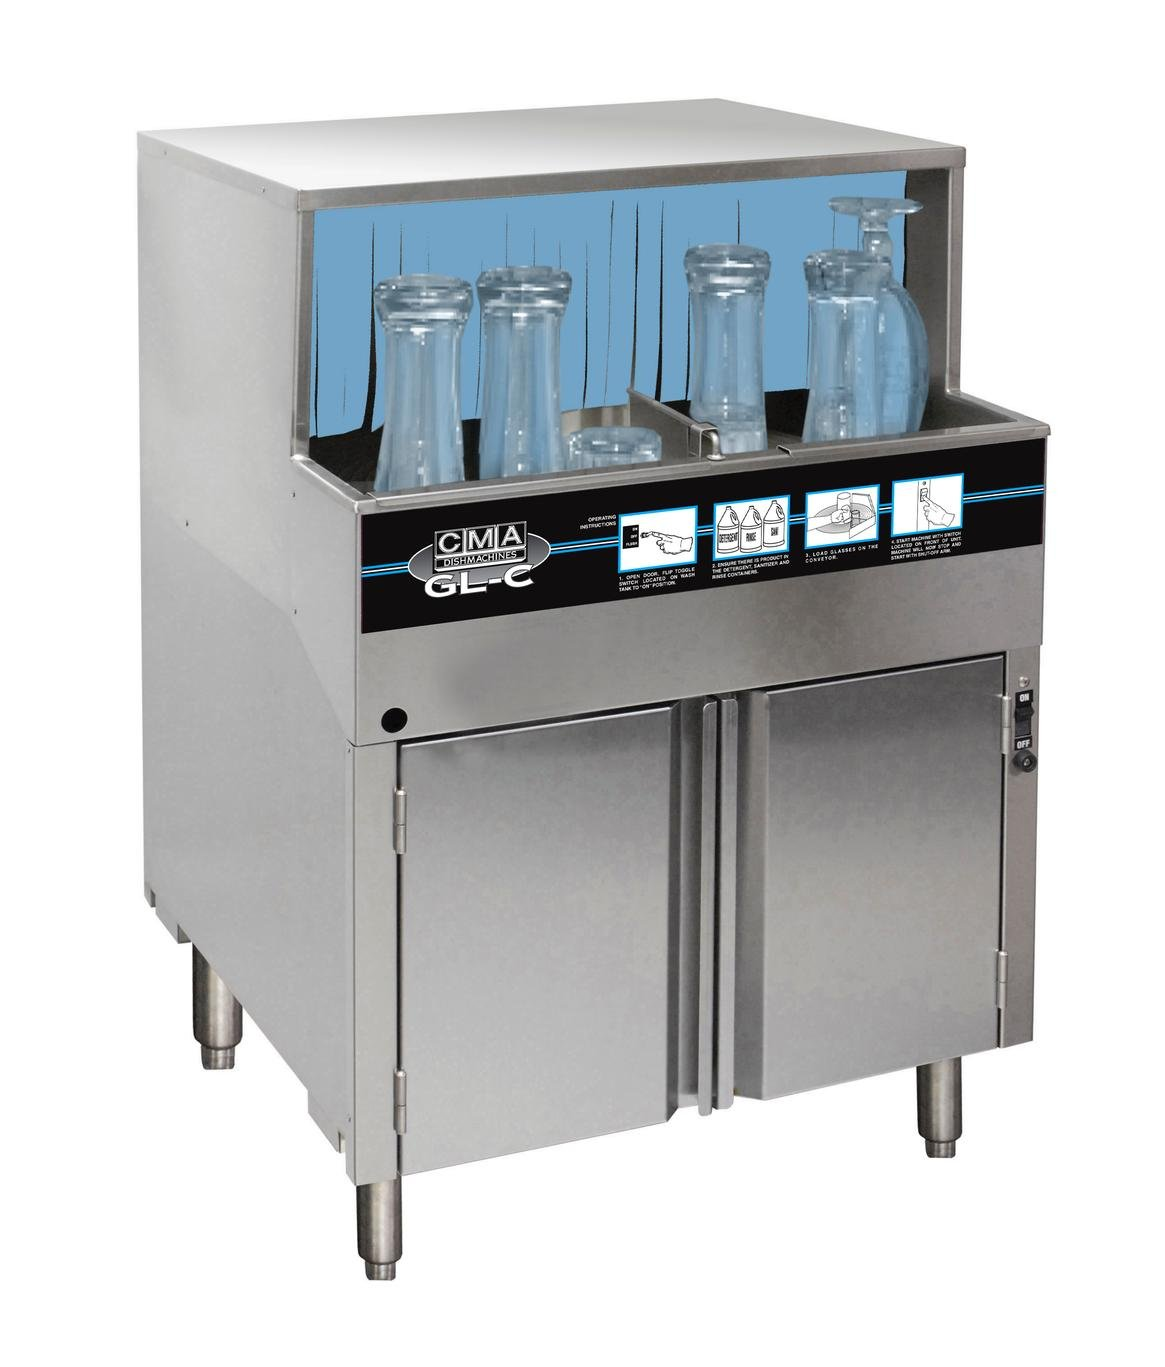 CMADish Low Temp Glasswashers GL-C